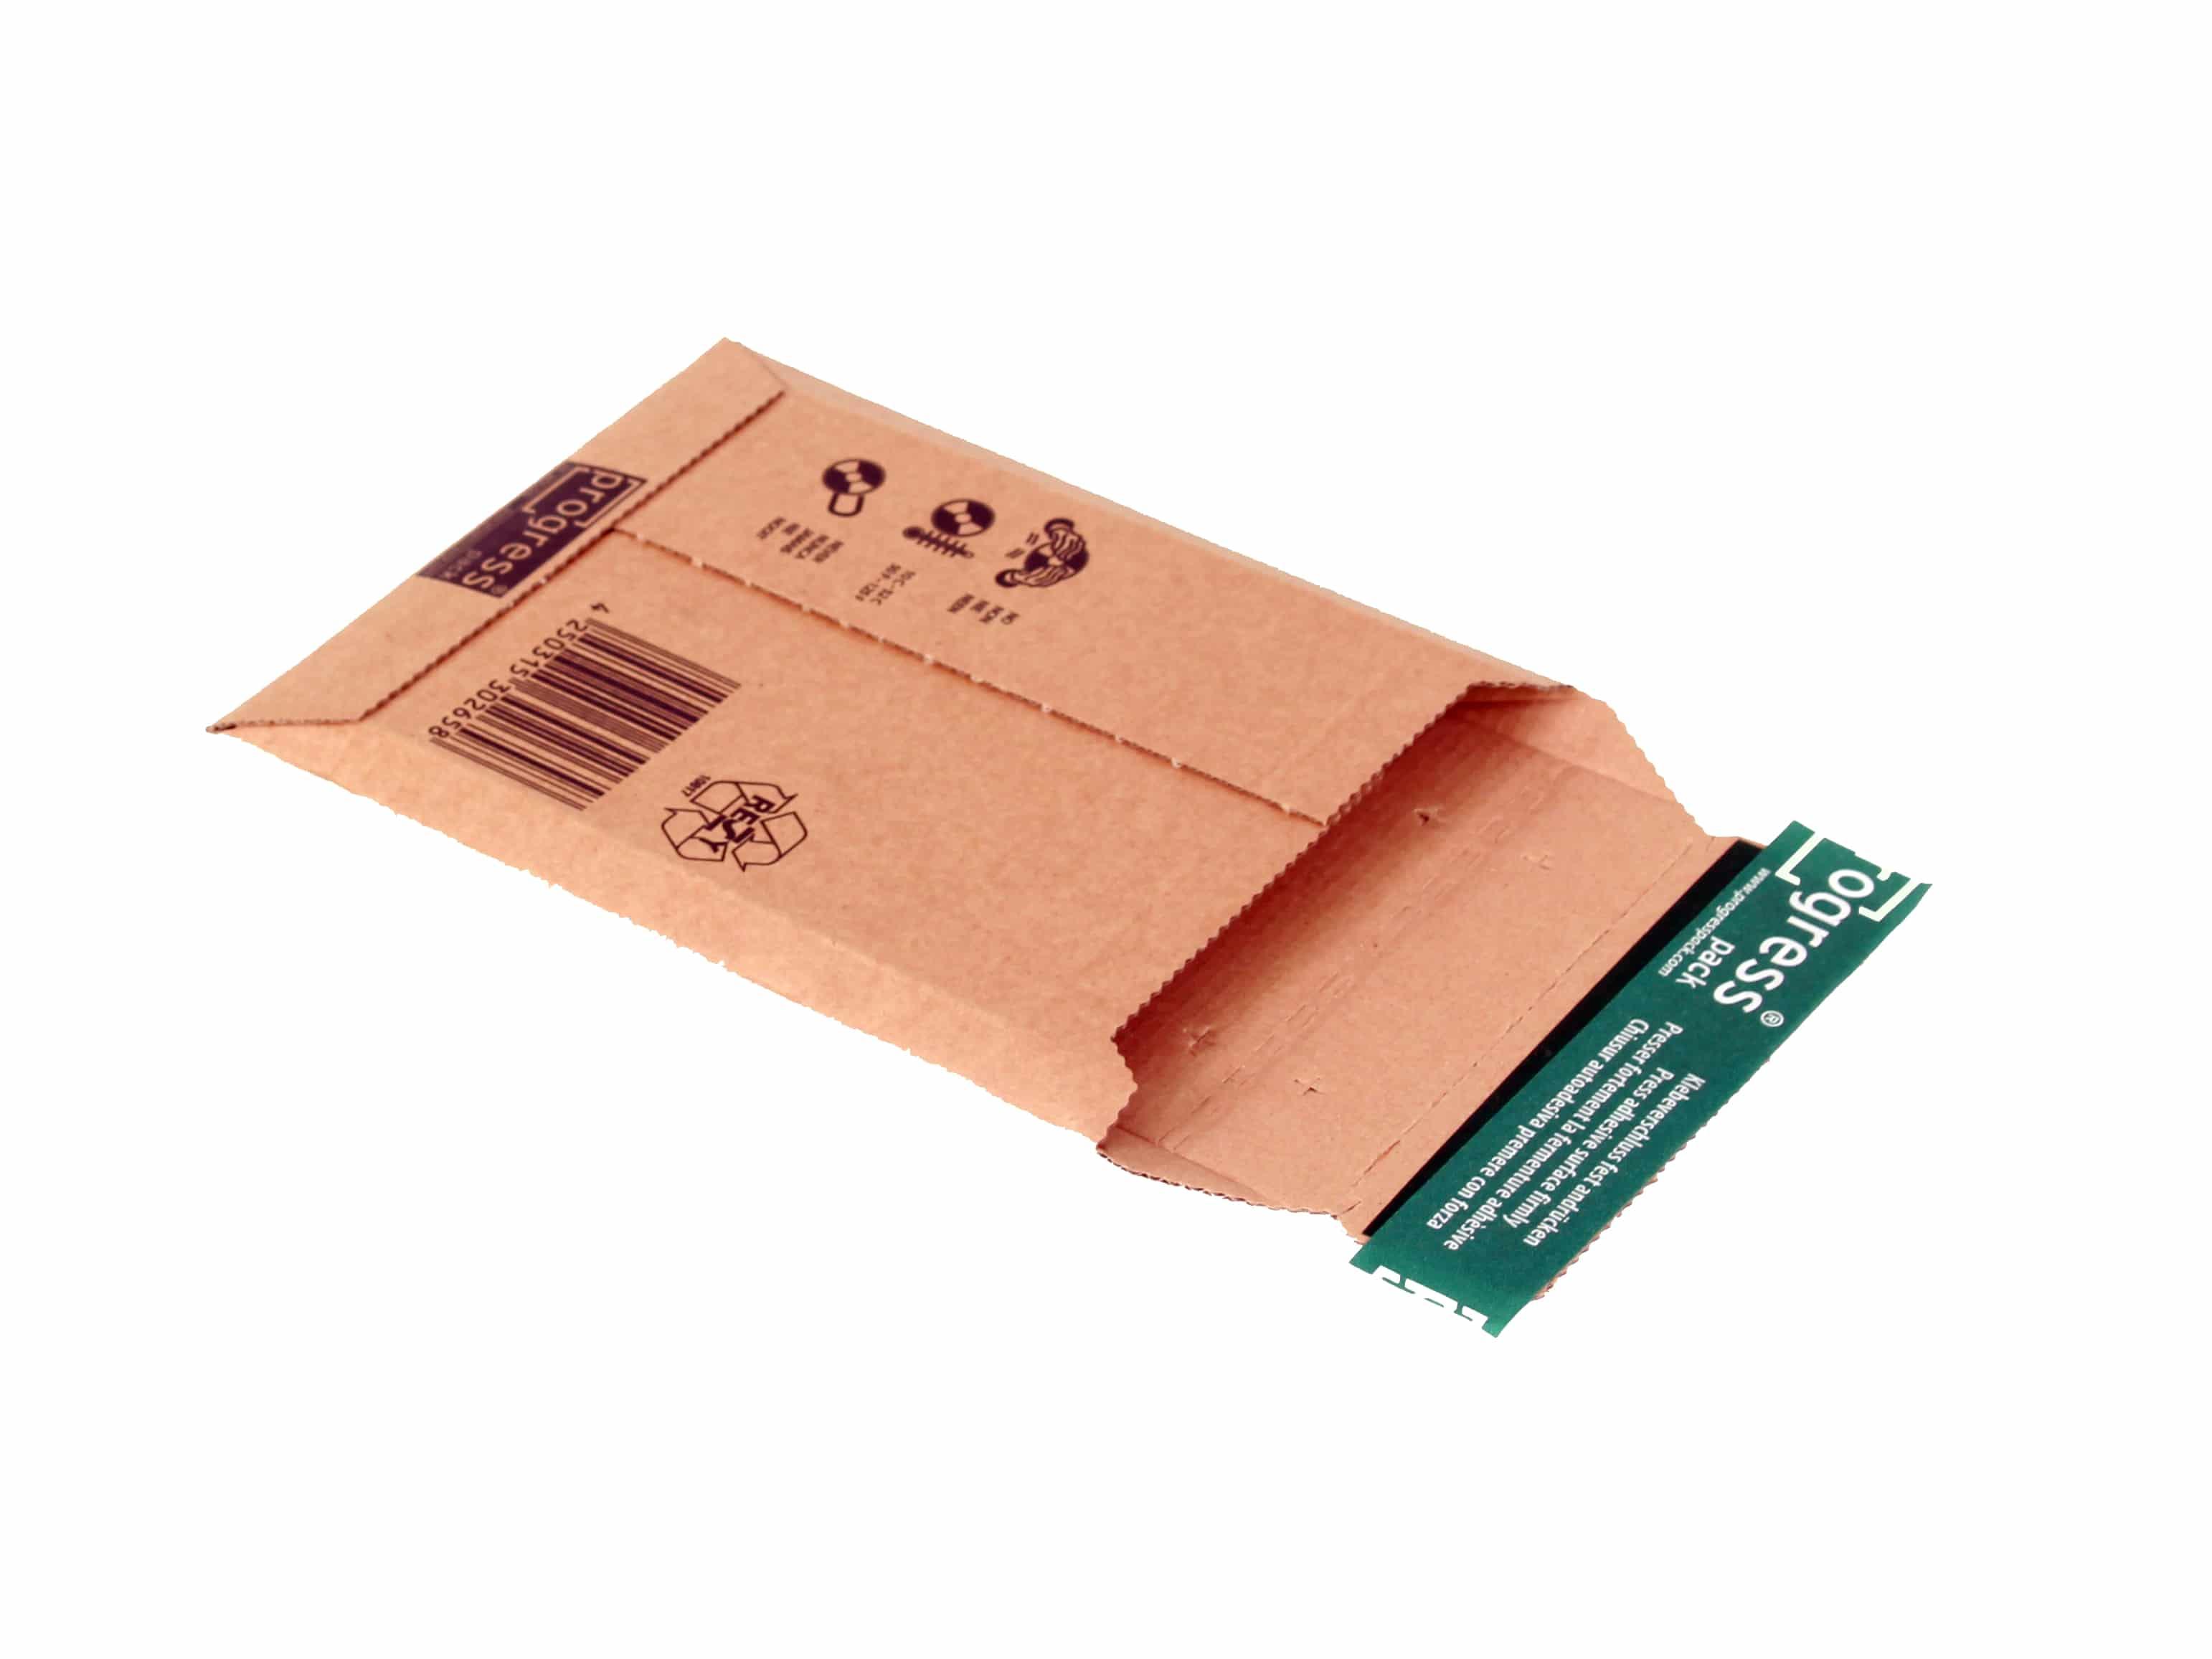 Kartonnen enveloppen CD Premium - 145 x 190 x 0-25mm (100 st)